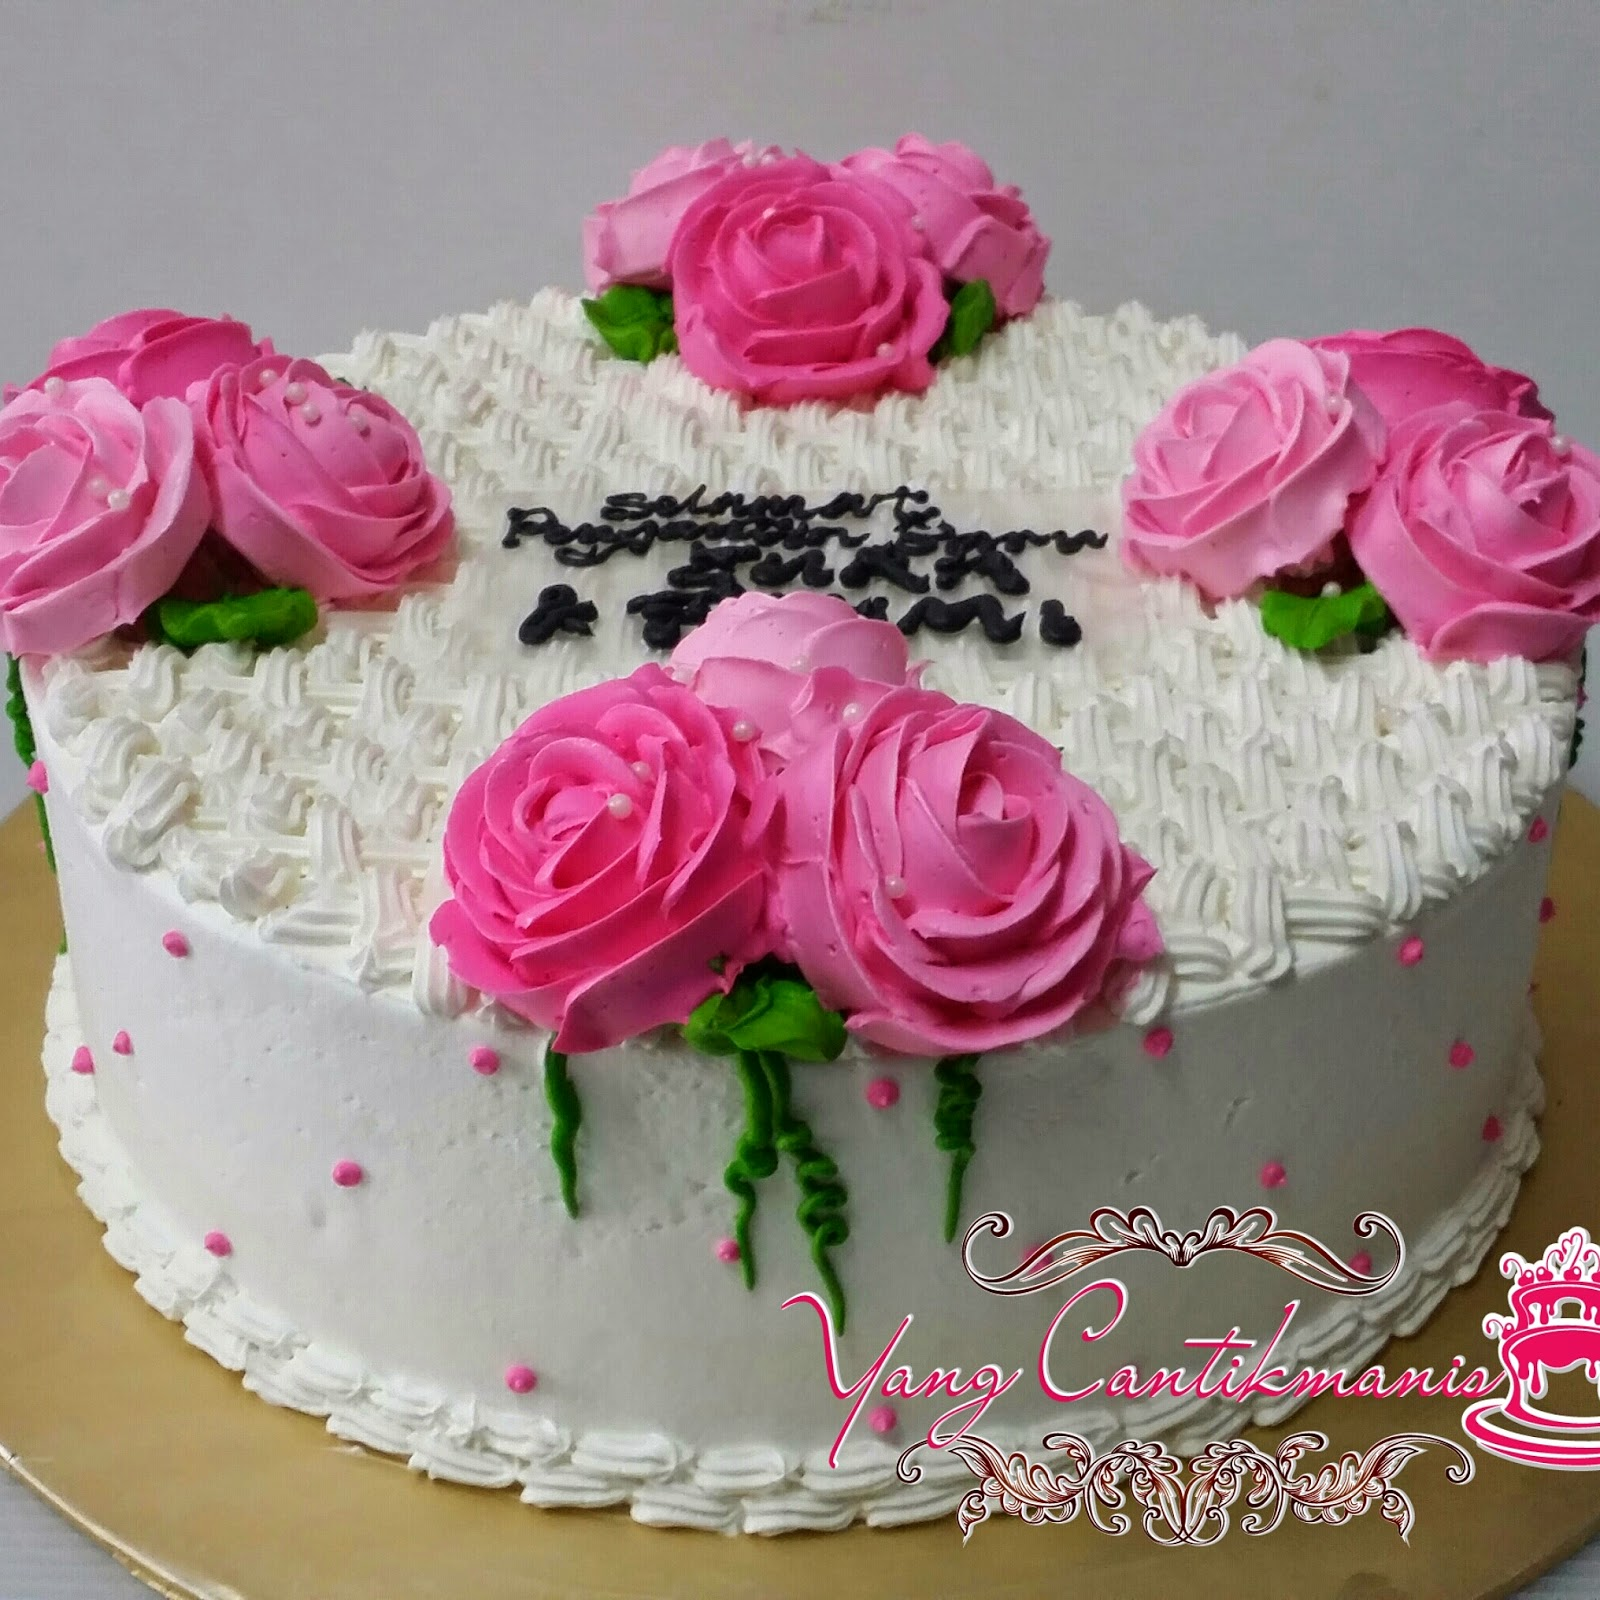 Yang Cantikmanis Bake Shoppe  Kek Kahwin Single Pink  Putih